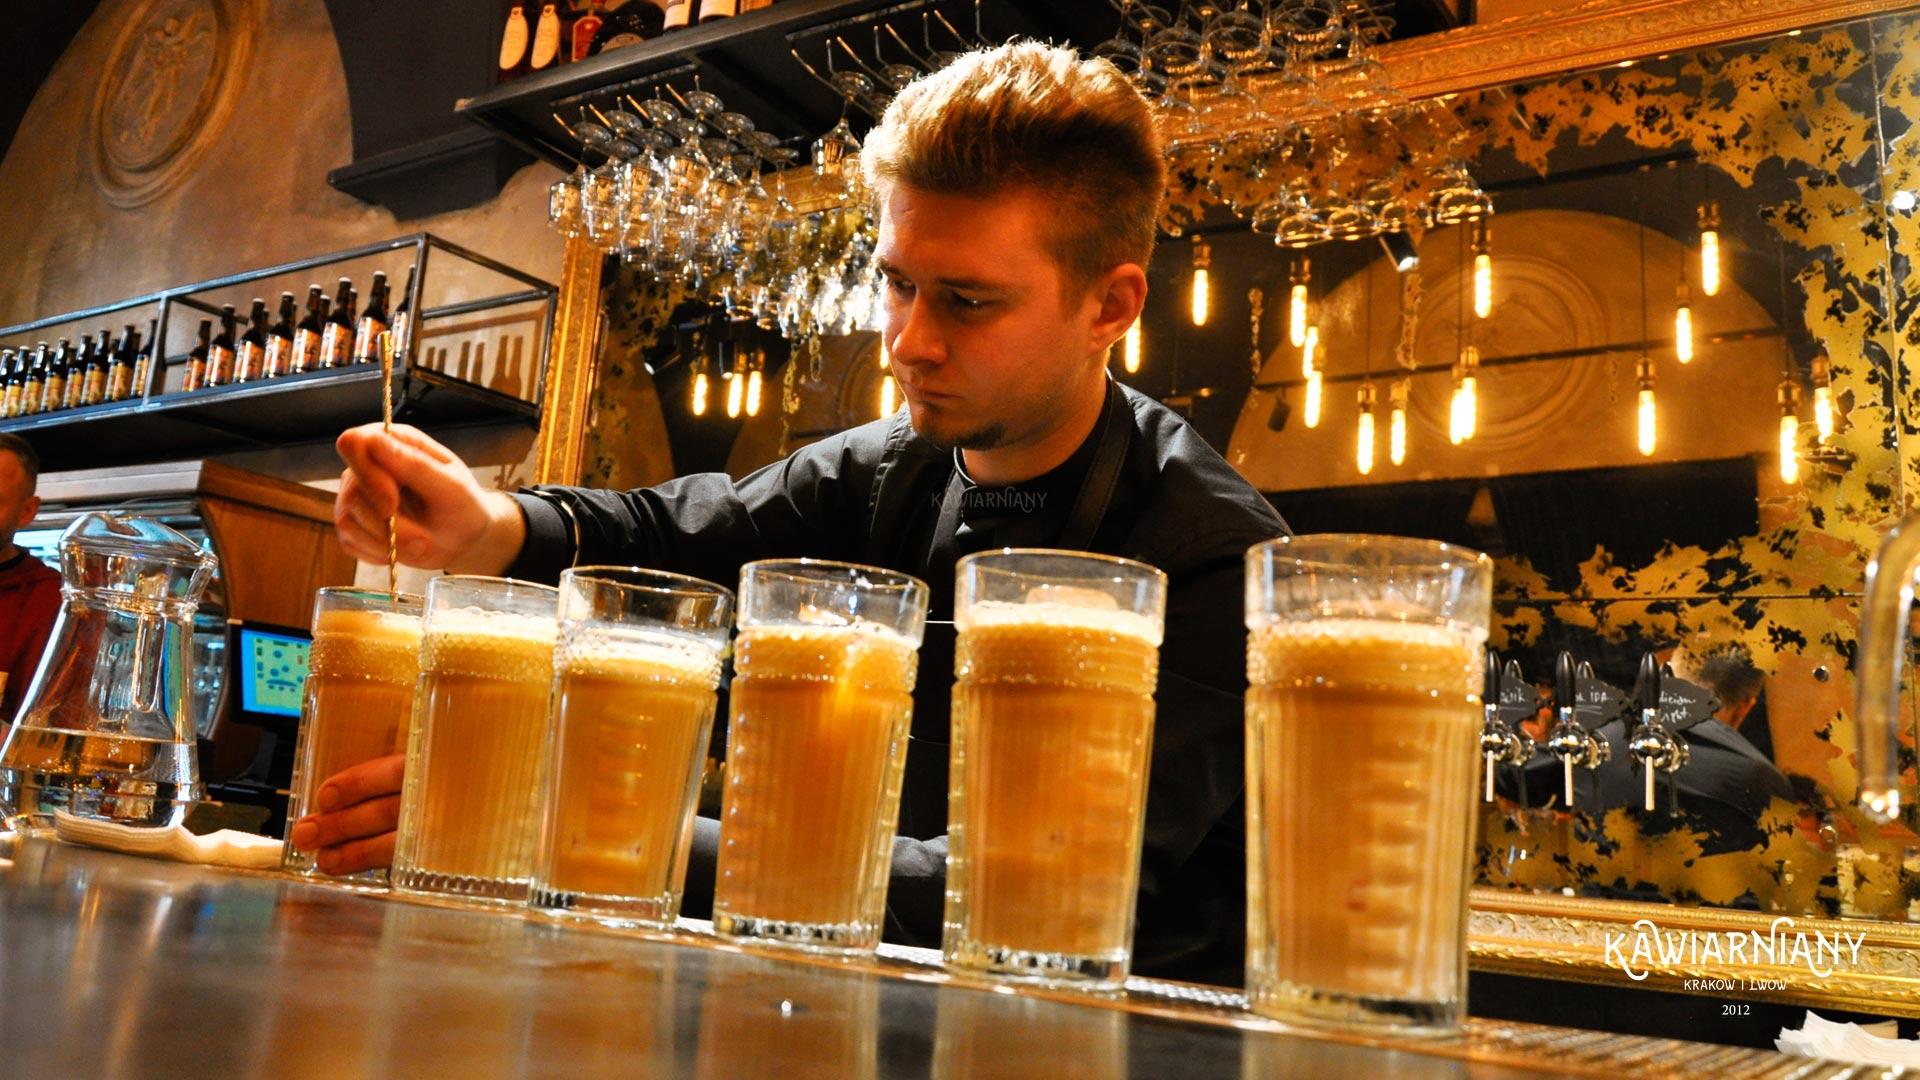 ukraińskie piwo craftowe